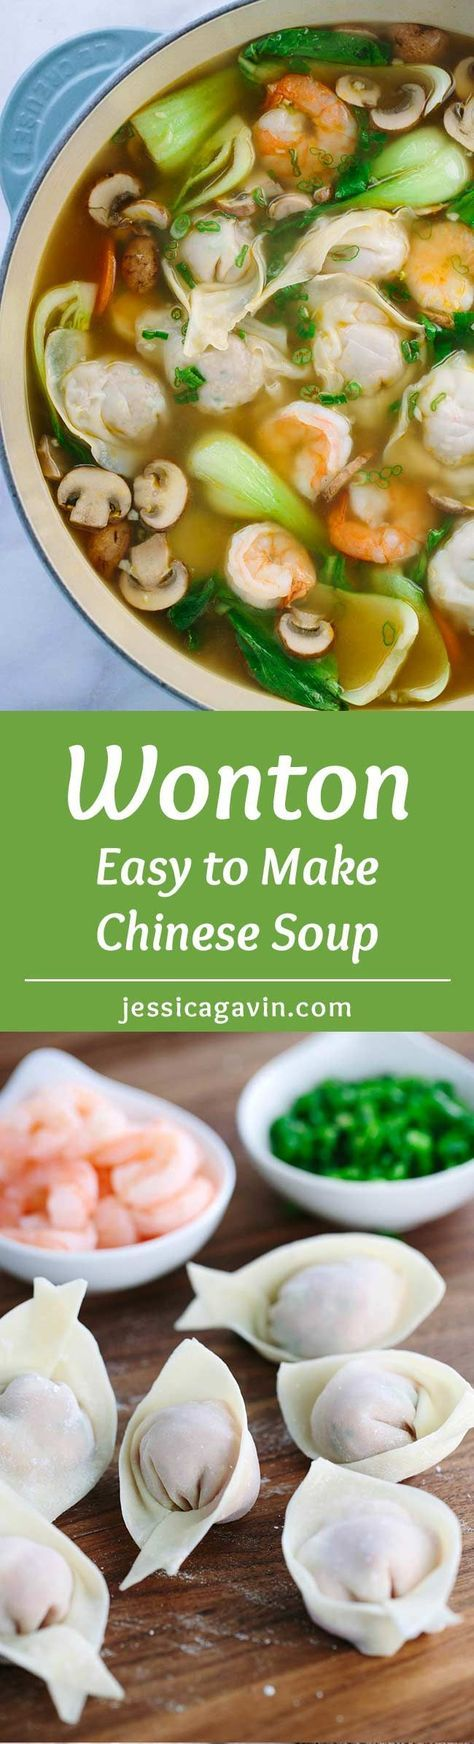 Easy Homemade Wonton Soup